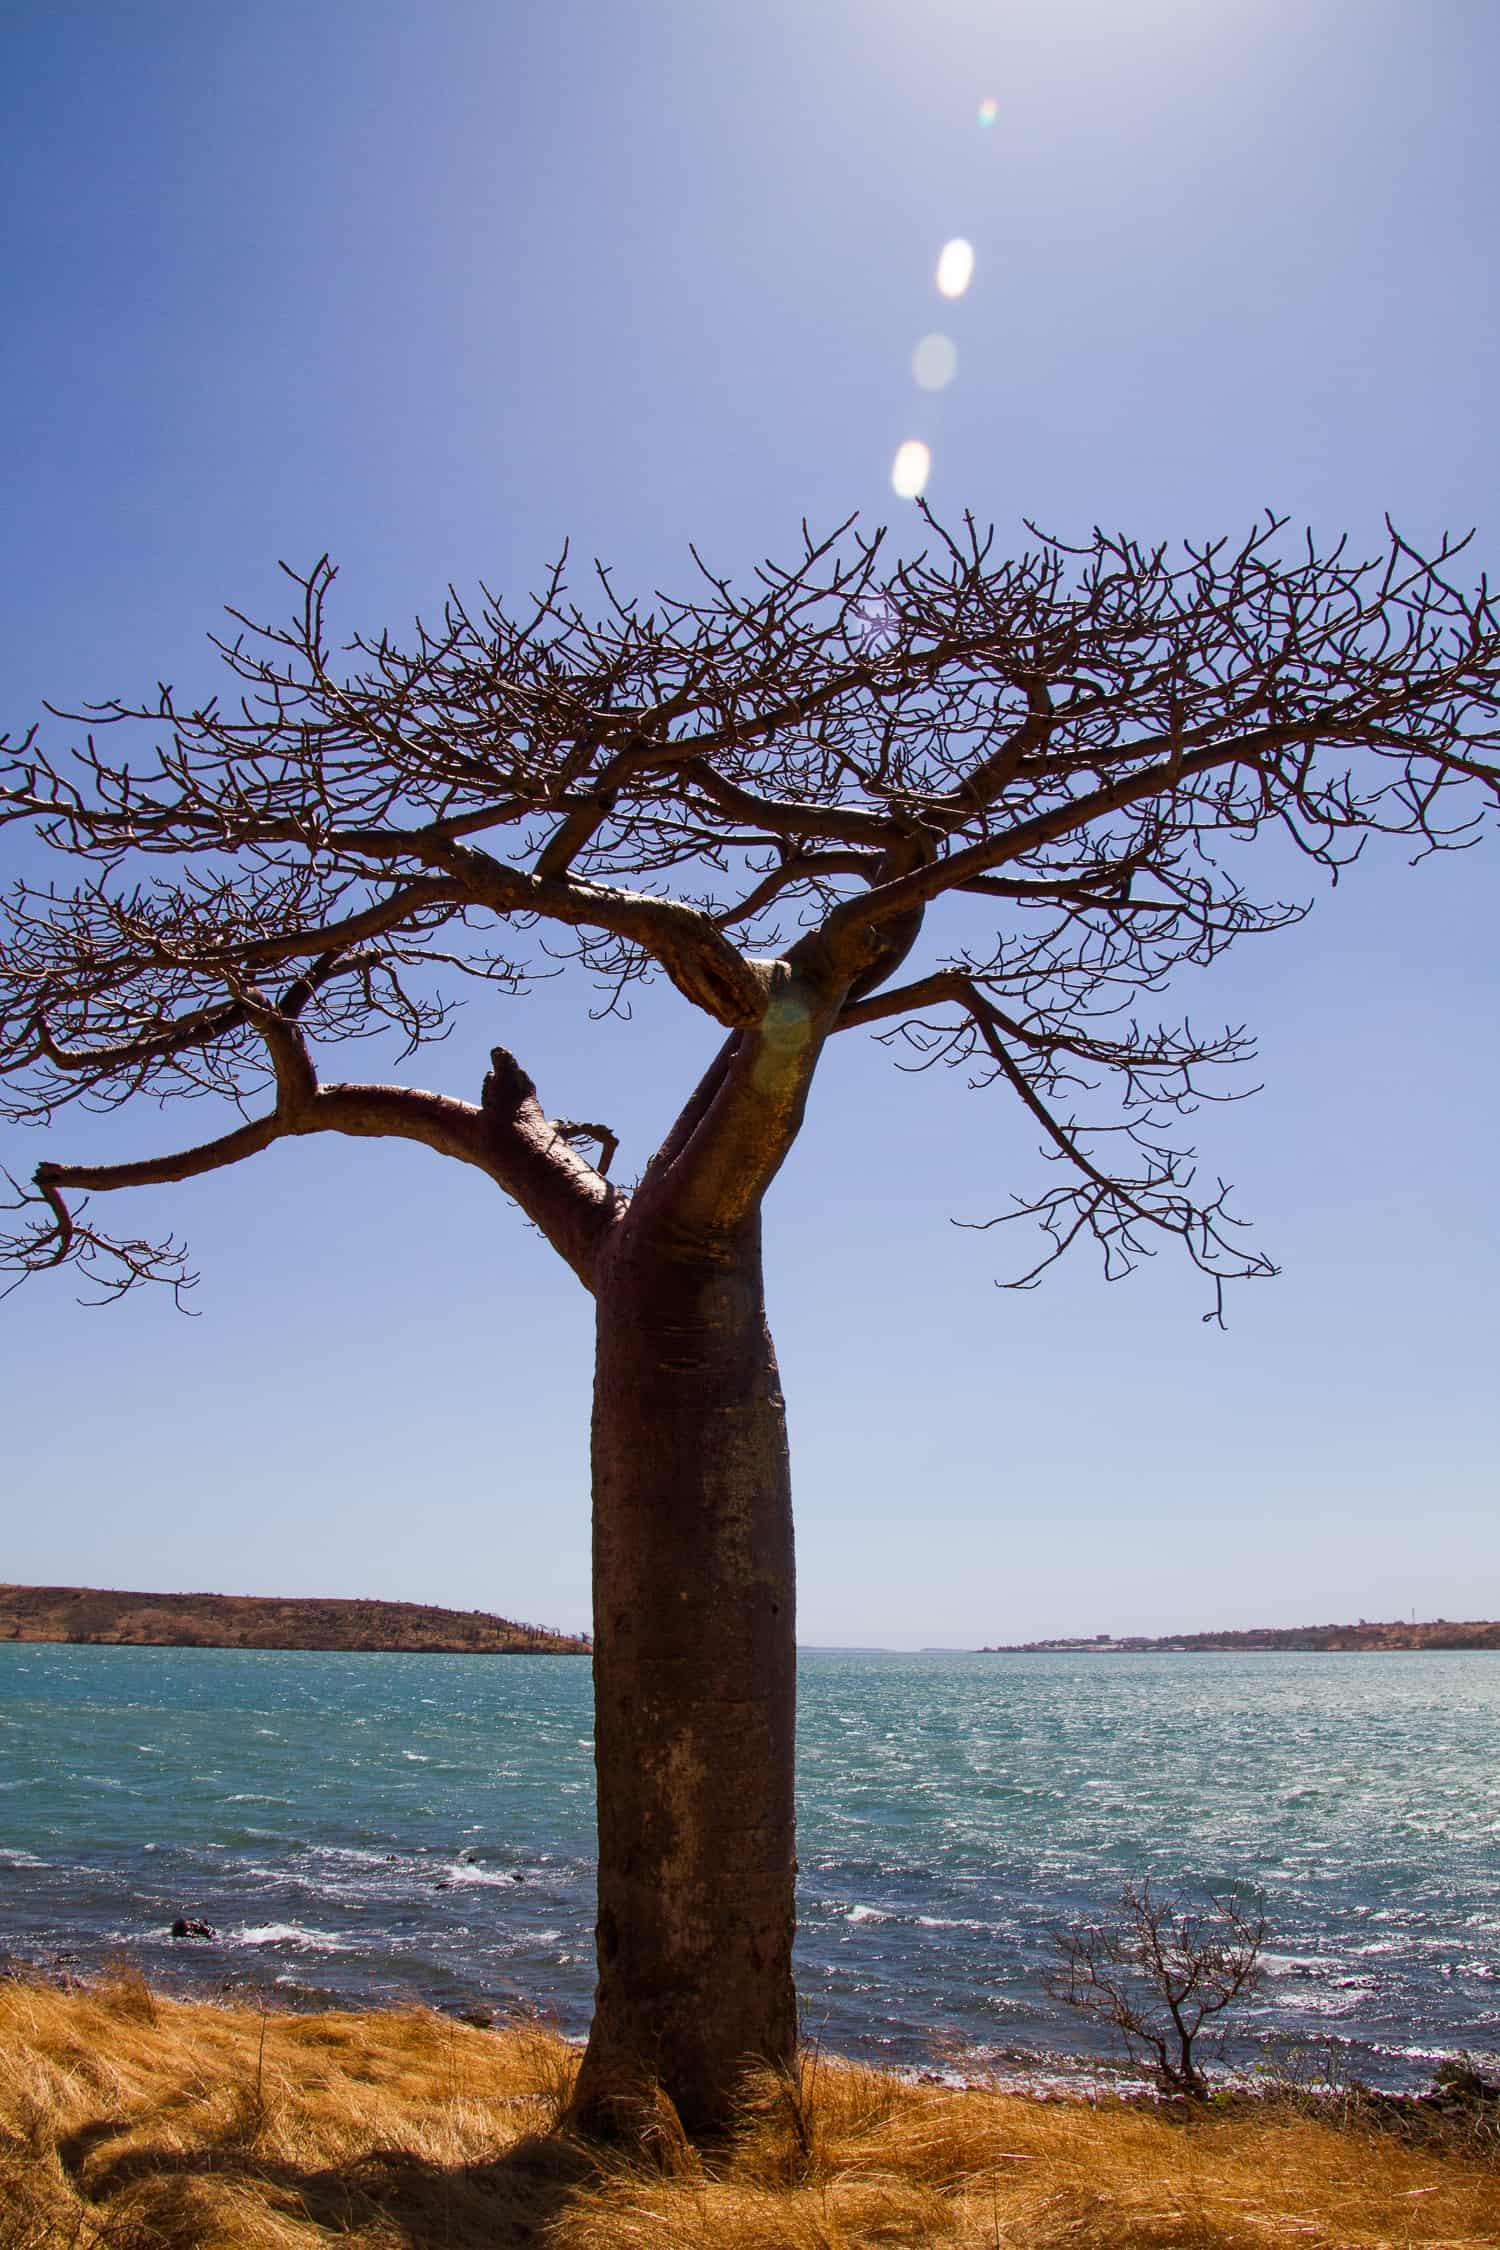 Standing Baobab tree in Madagascar via @insidetravellab